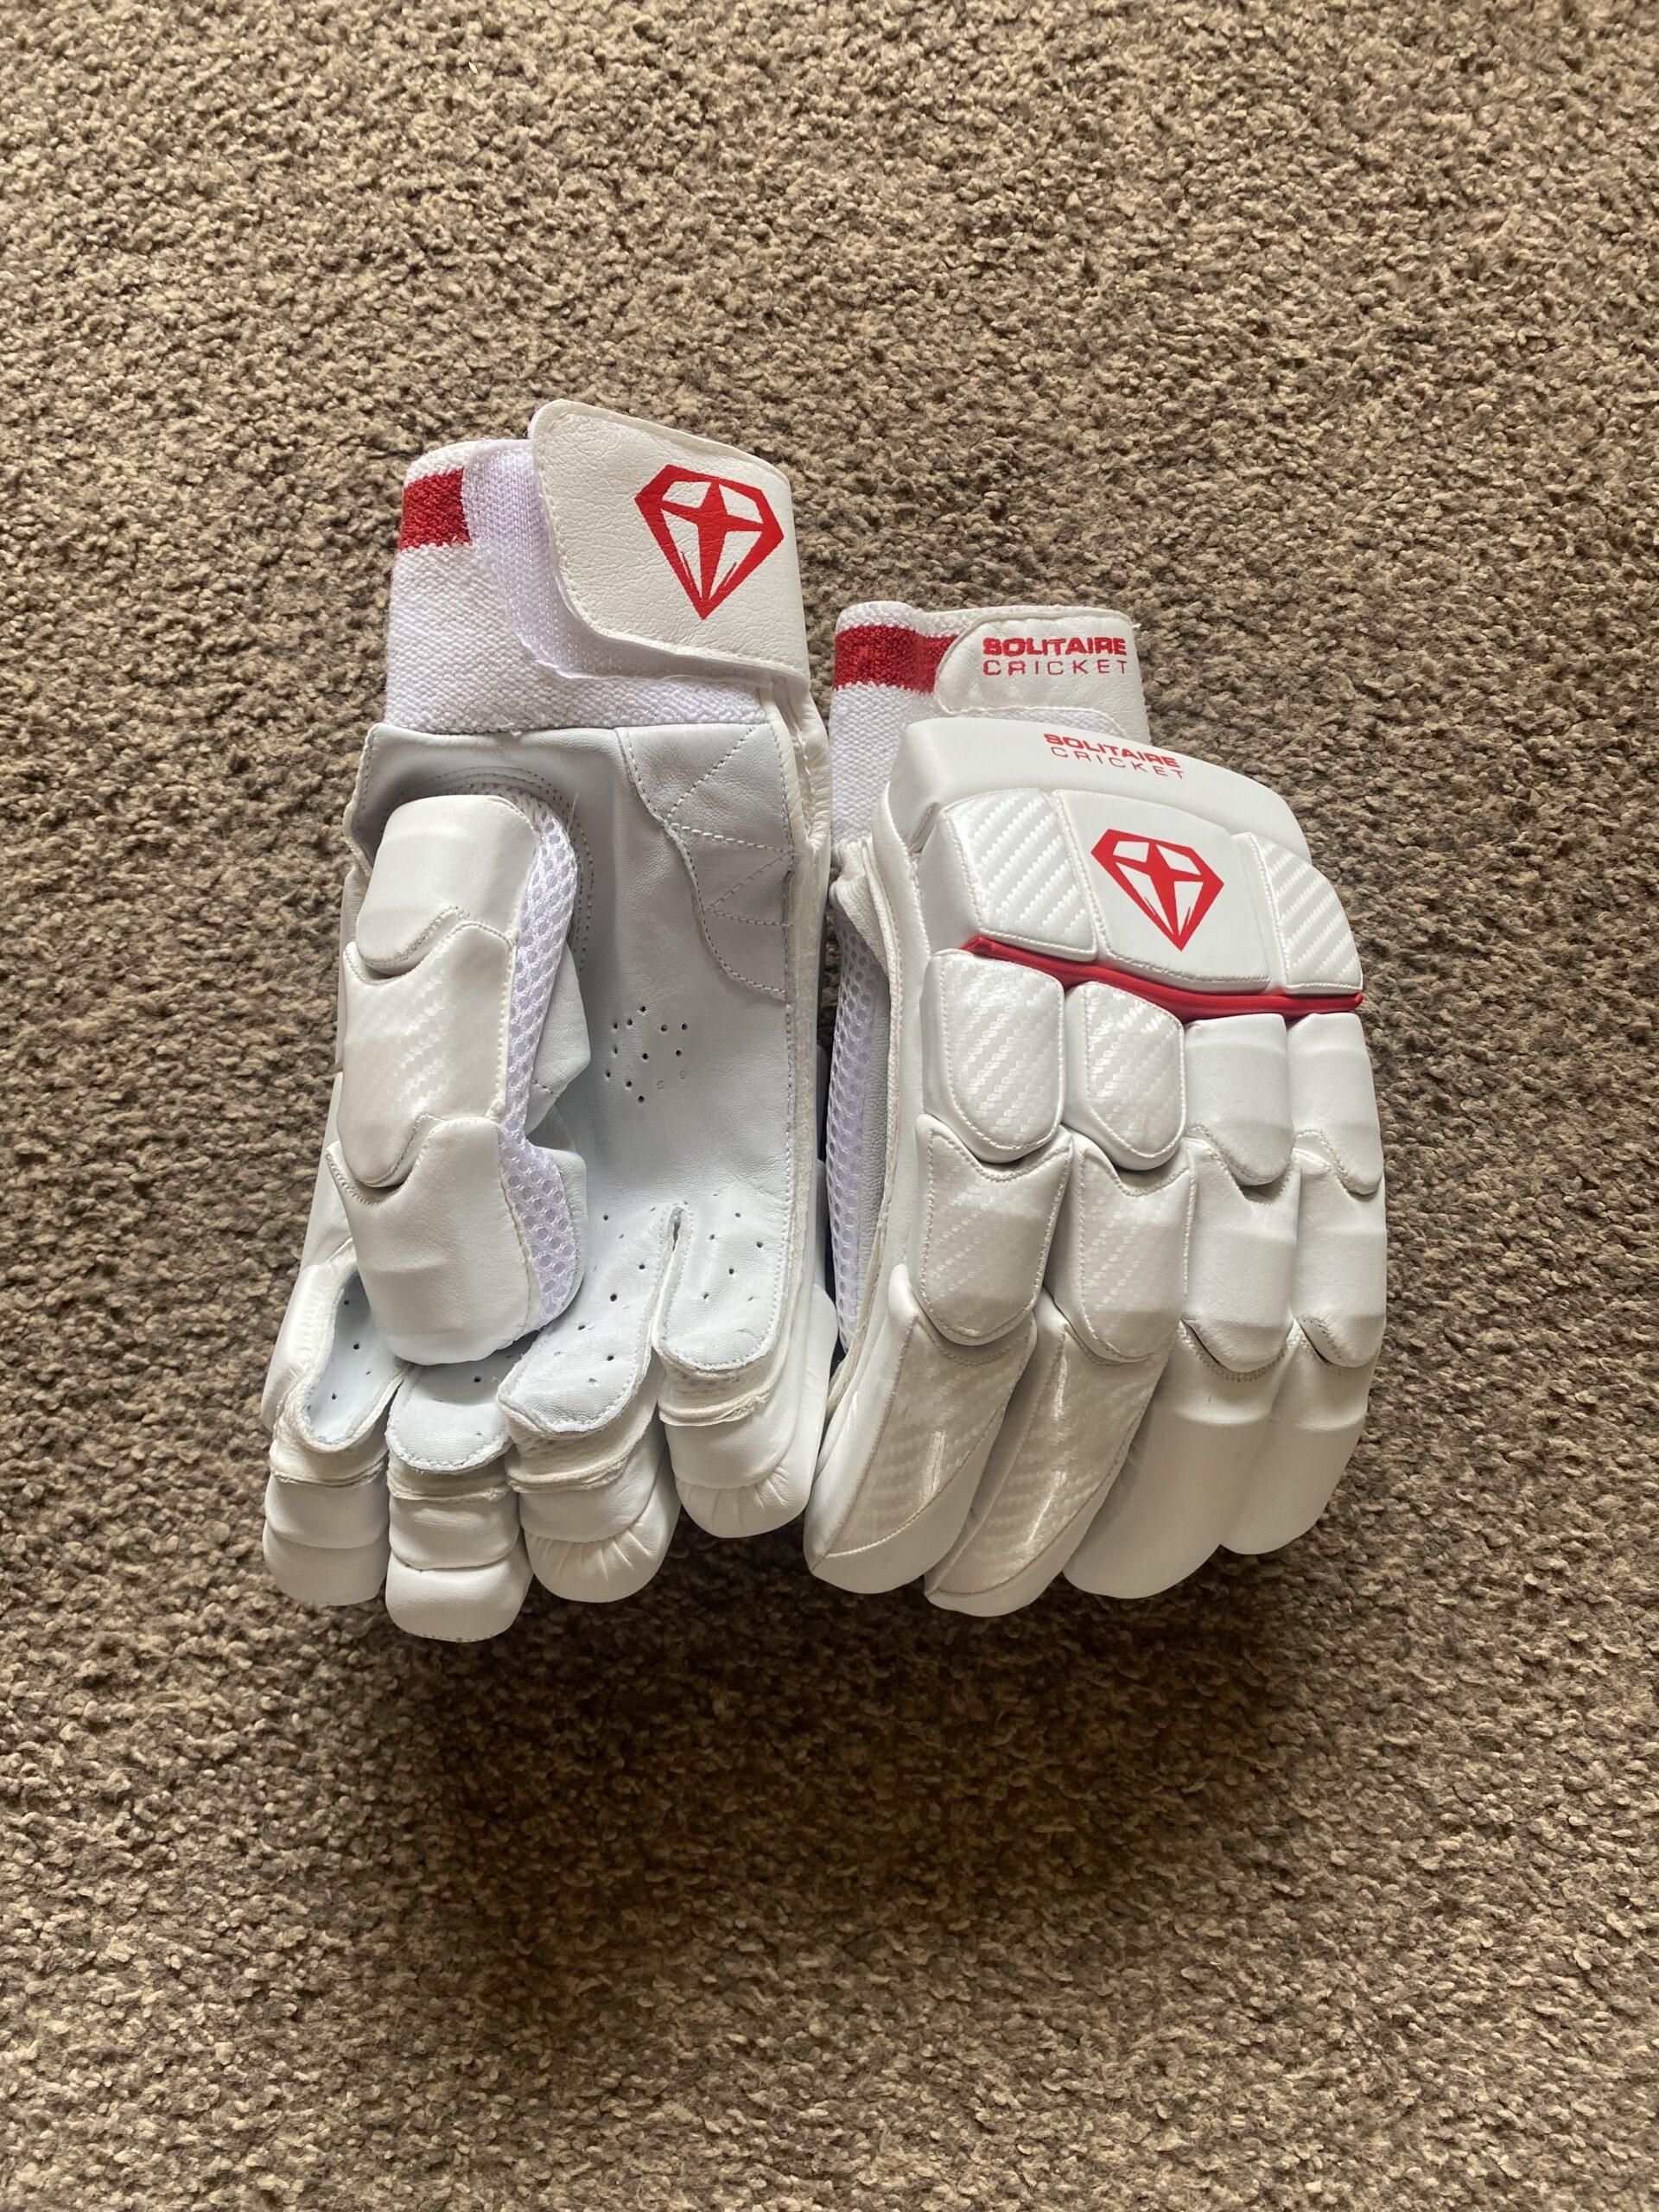 Solitaire Batting Gloves